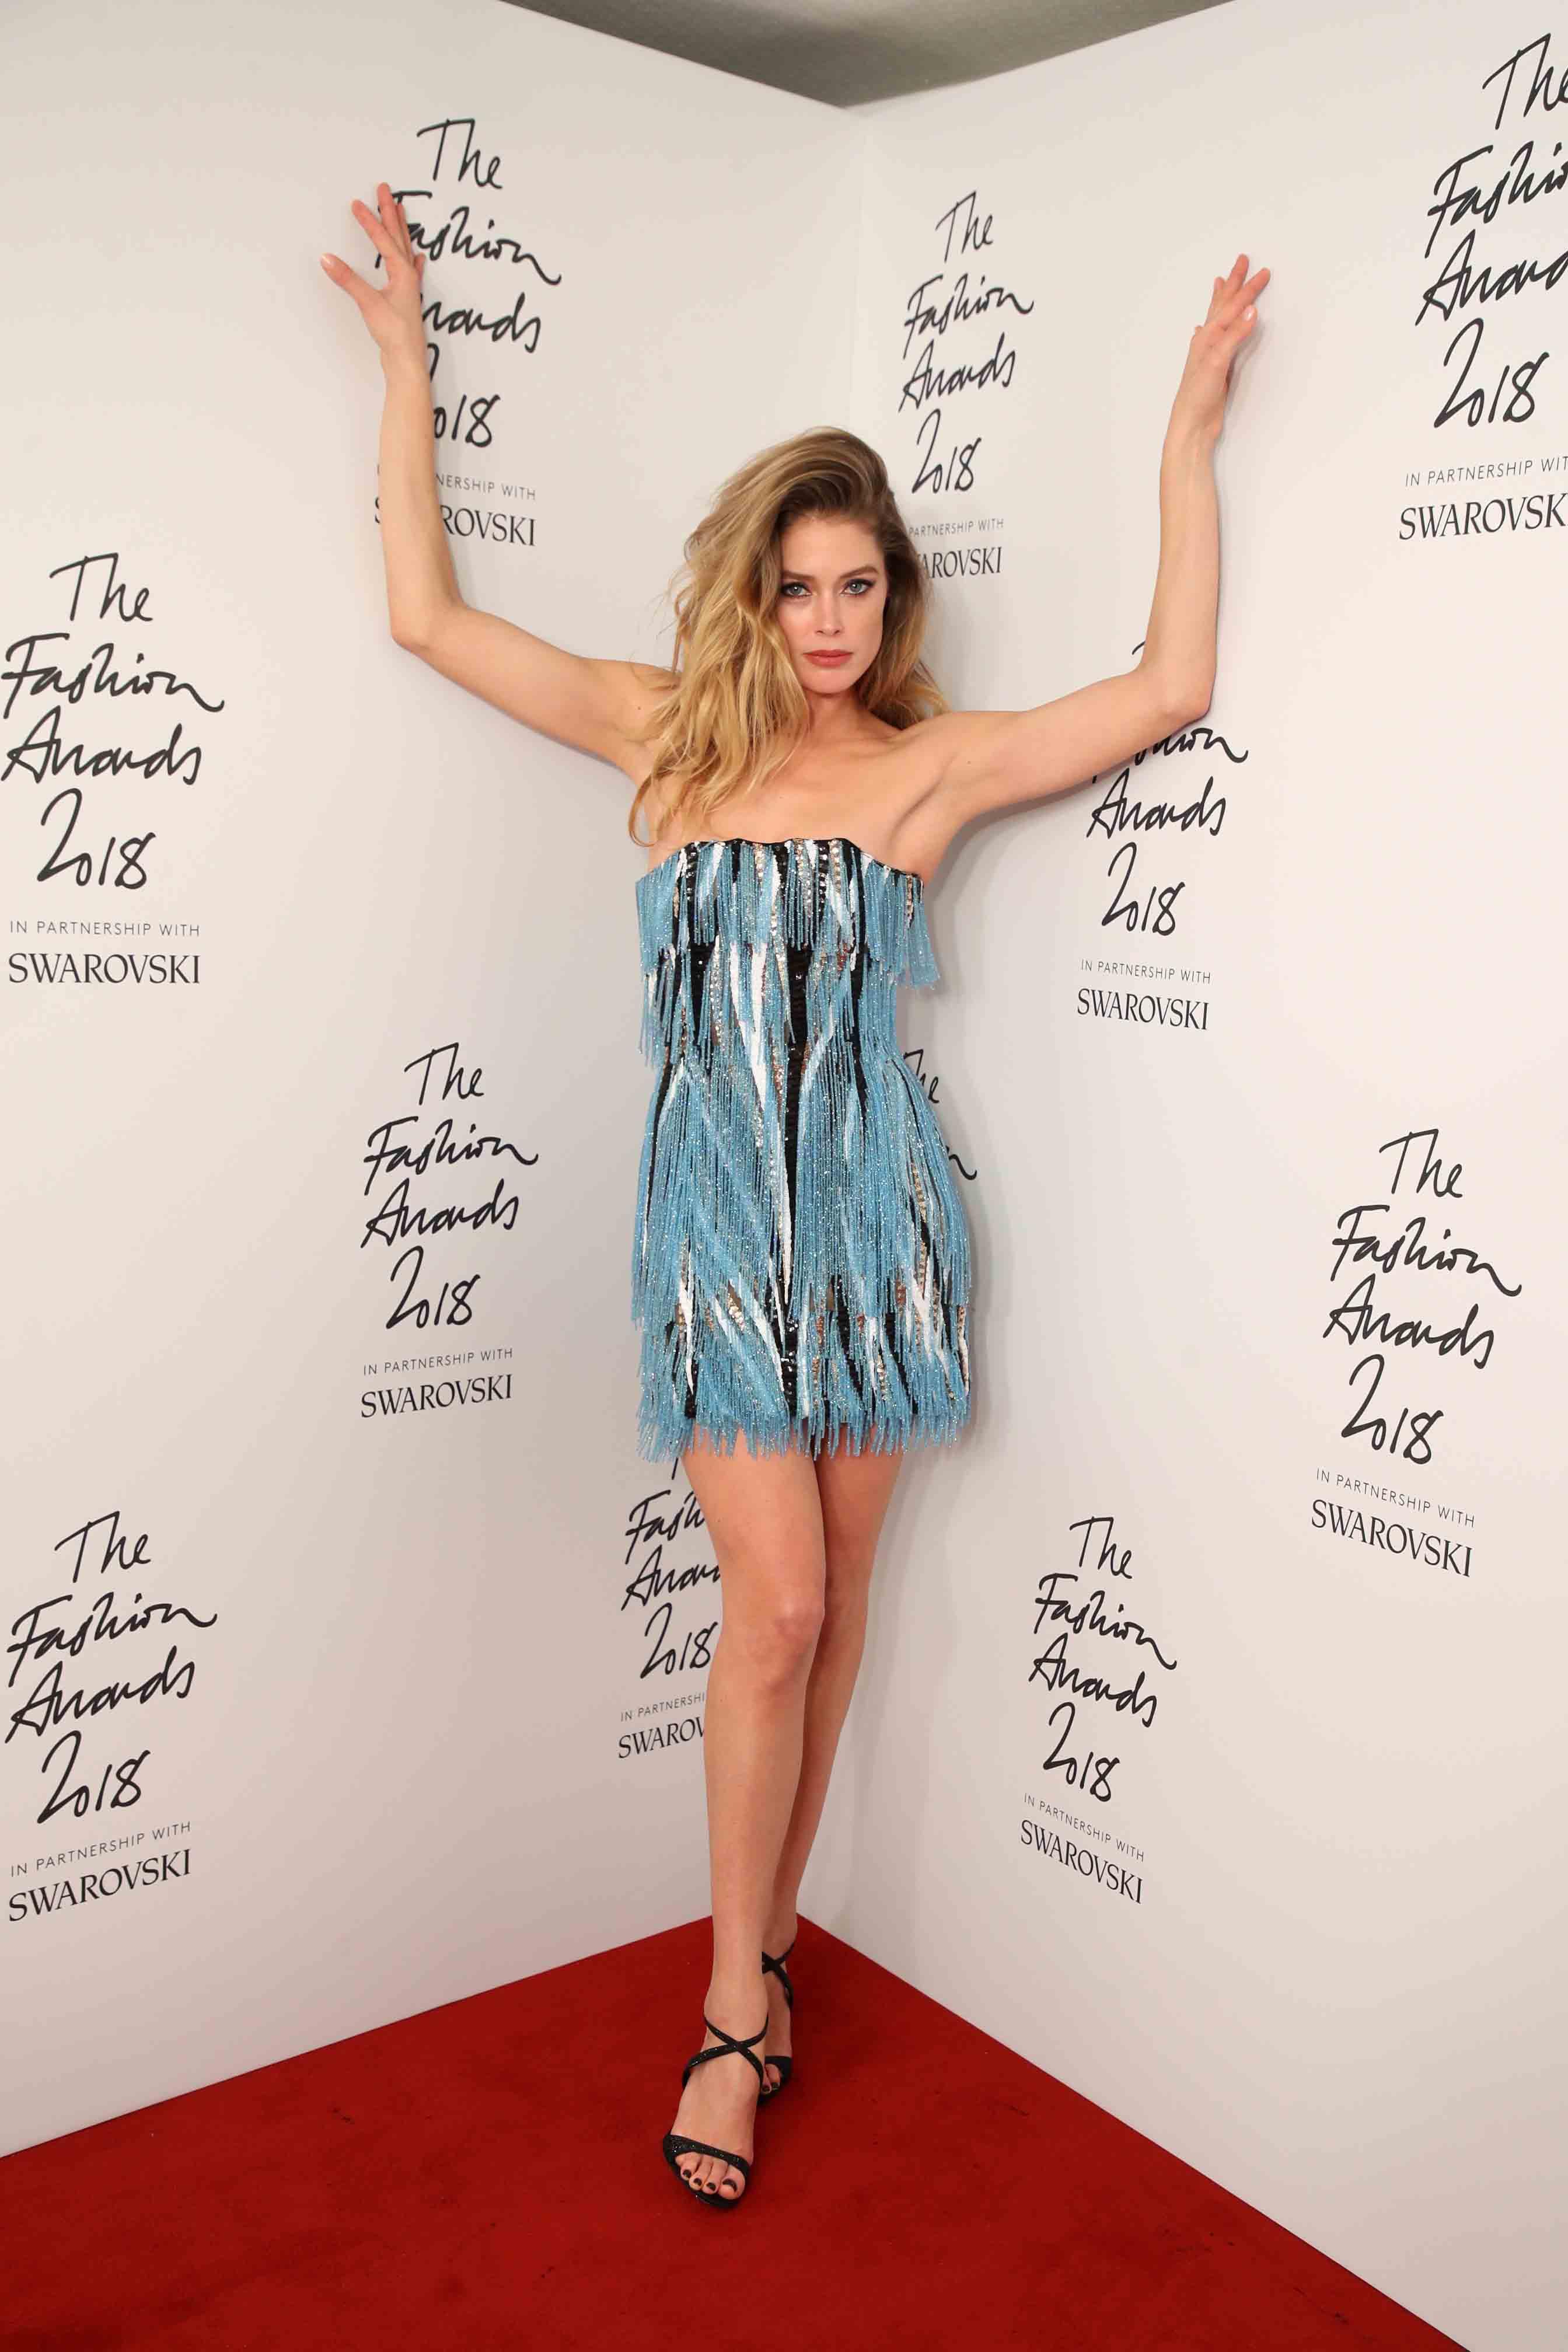 The fashion awards 2018 in partnership with swarovski winners room